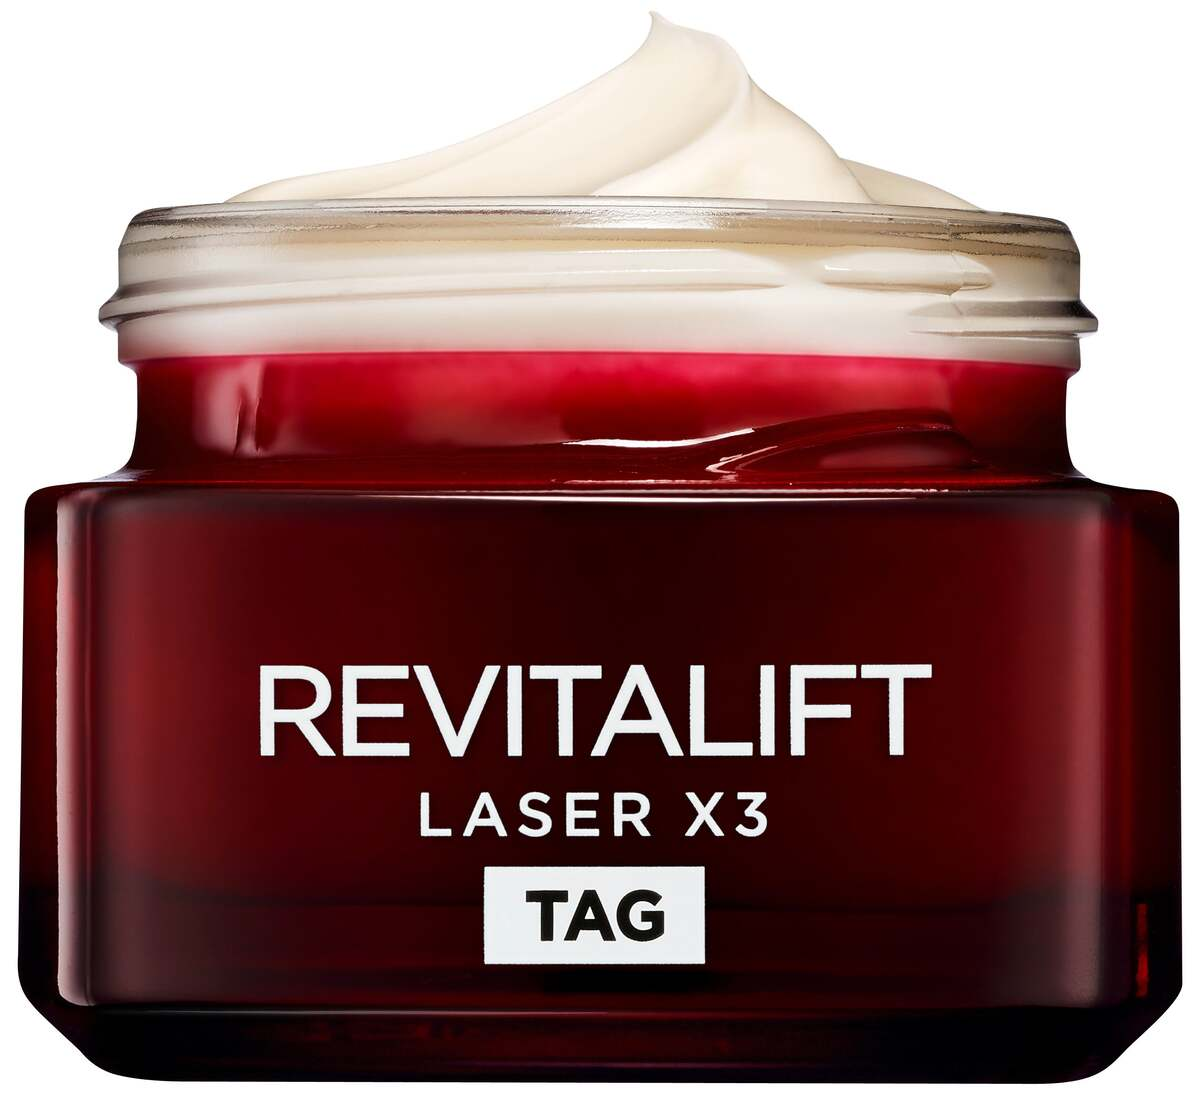 Bild 4 von L Oréal Paris Revitalift Laser X3 Anti-Falten Pflege 29.98 EUR/ 100 ml